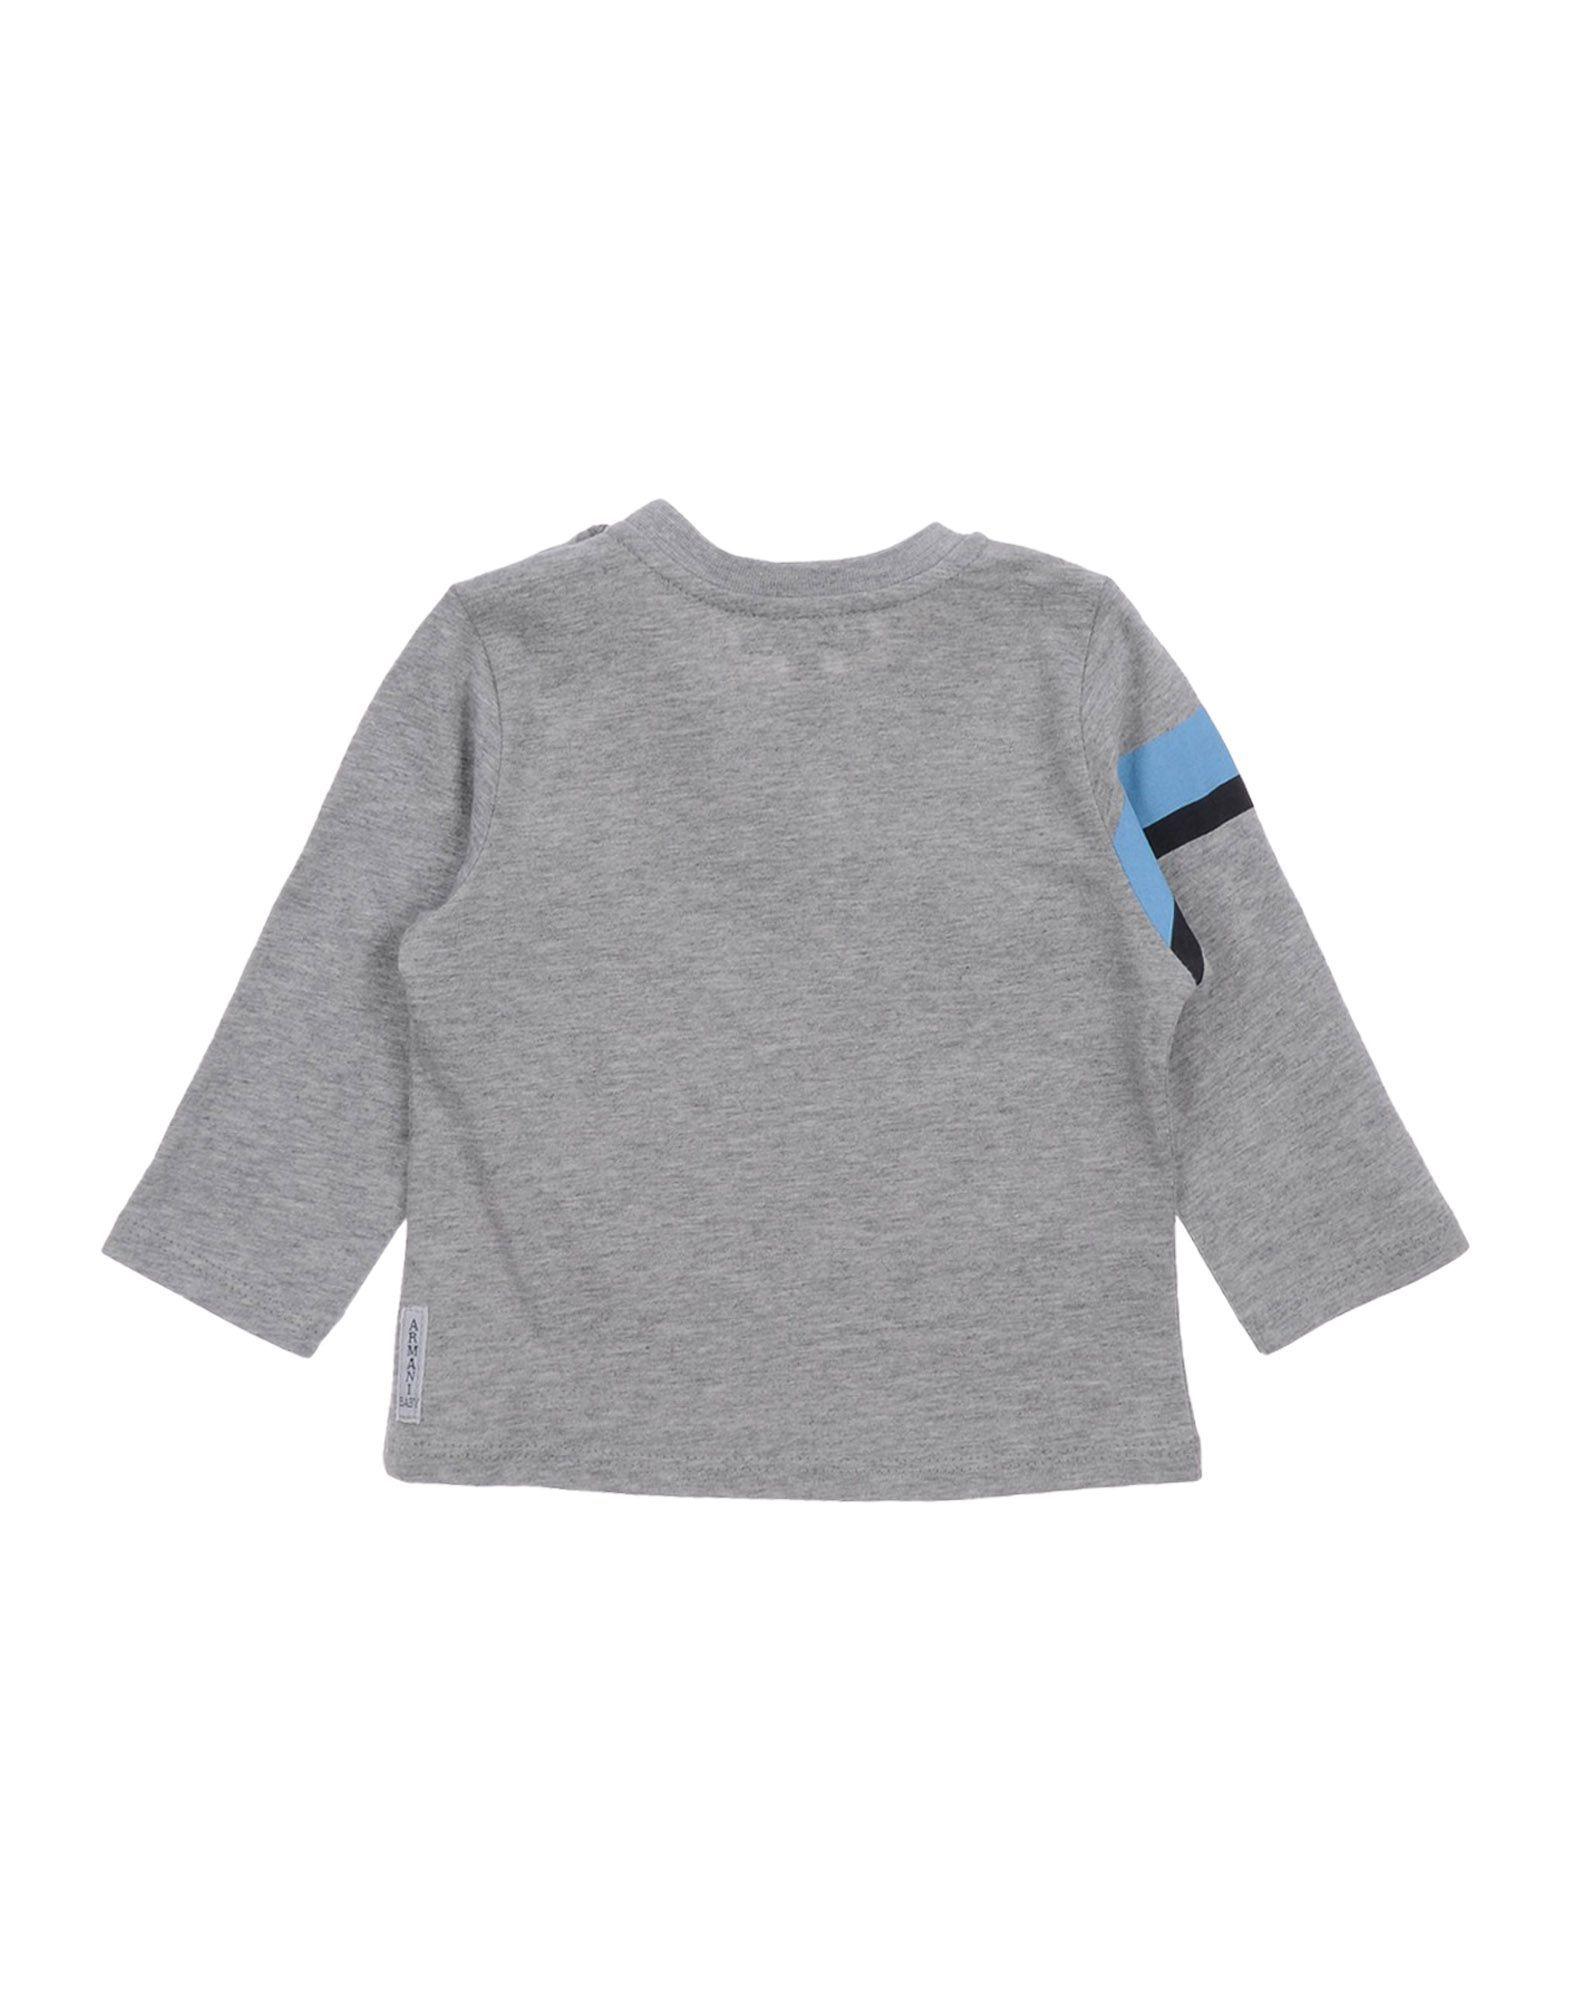 TOPWEAR Armani Junior Light grey Boy Cotton